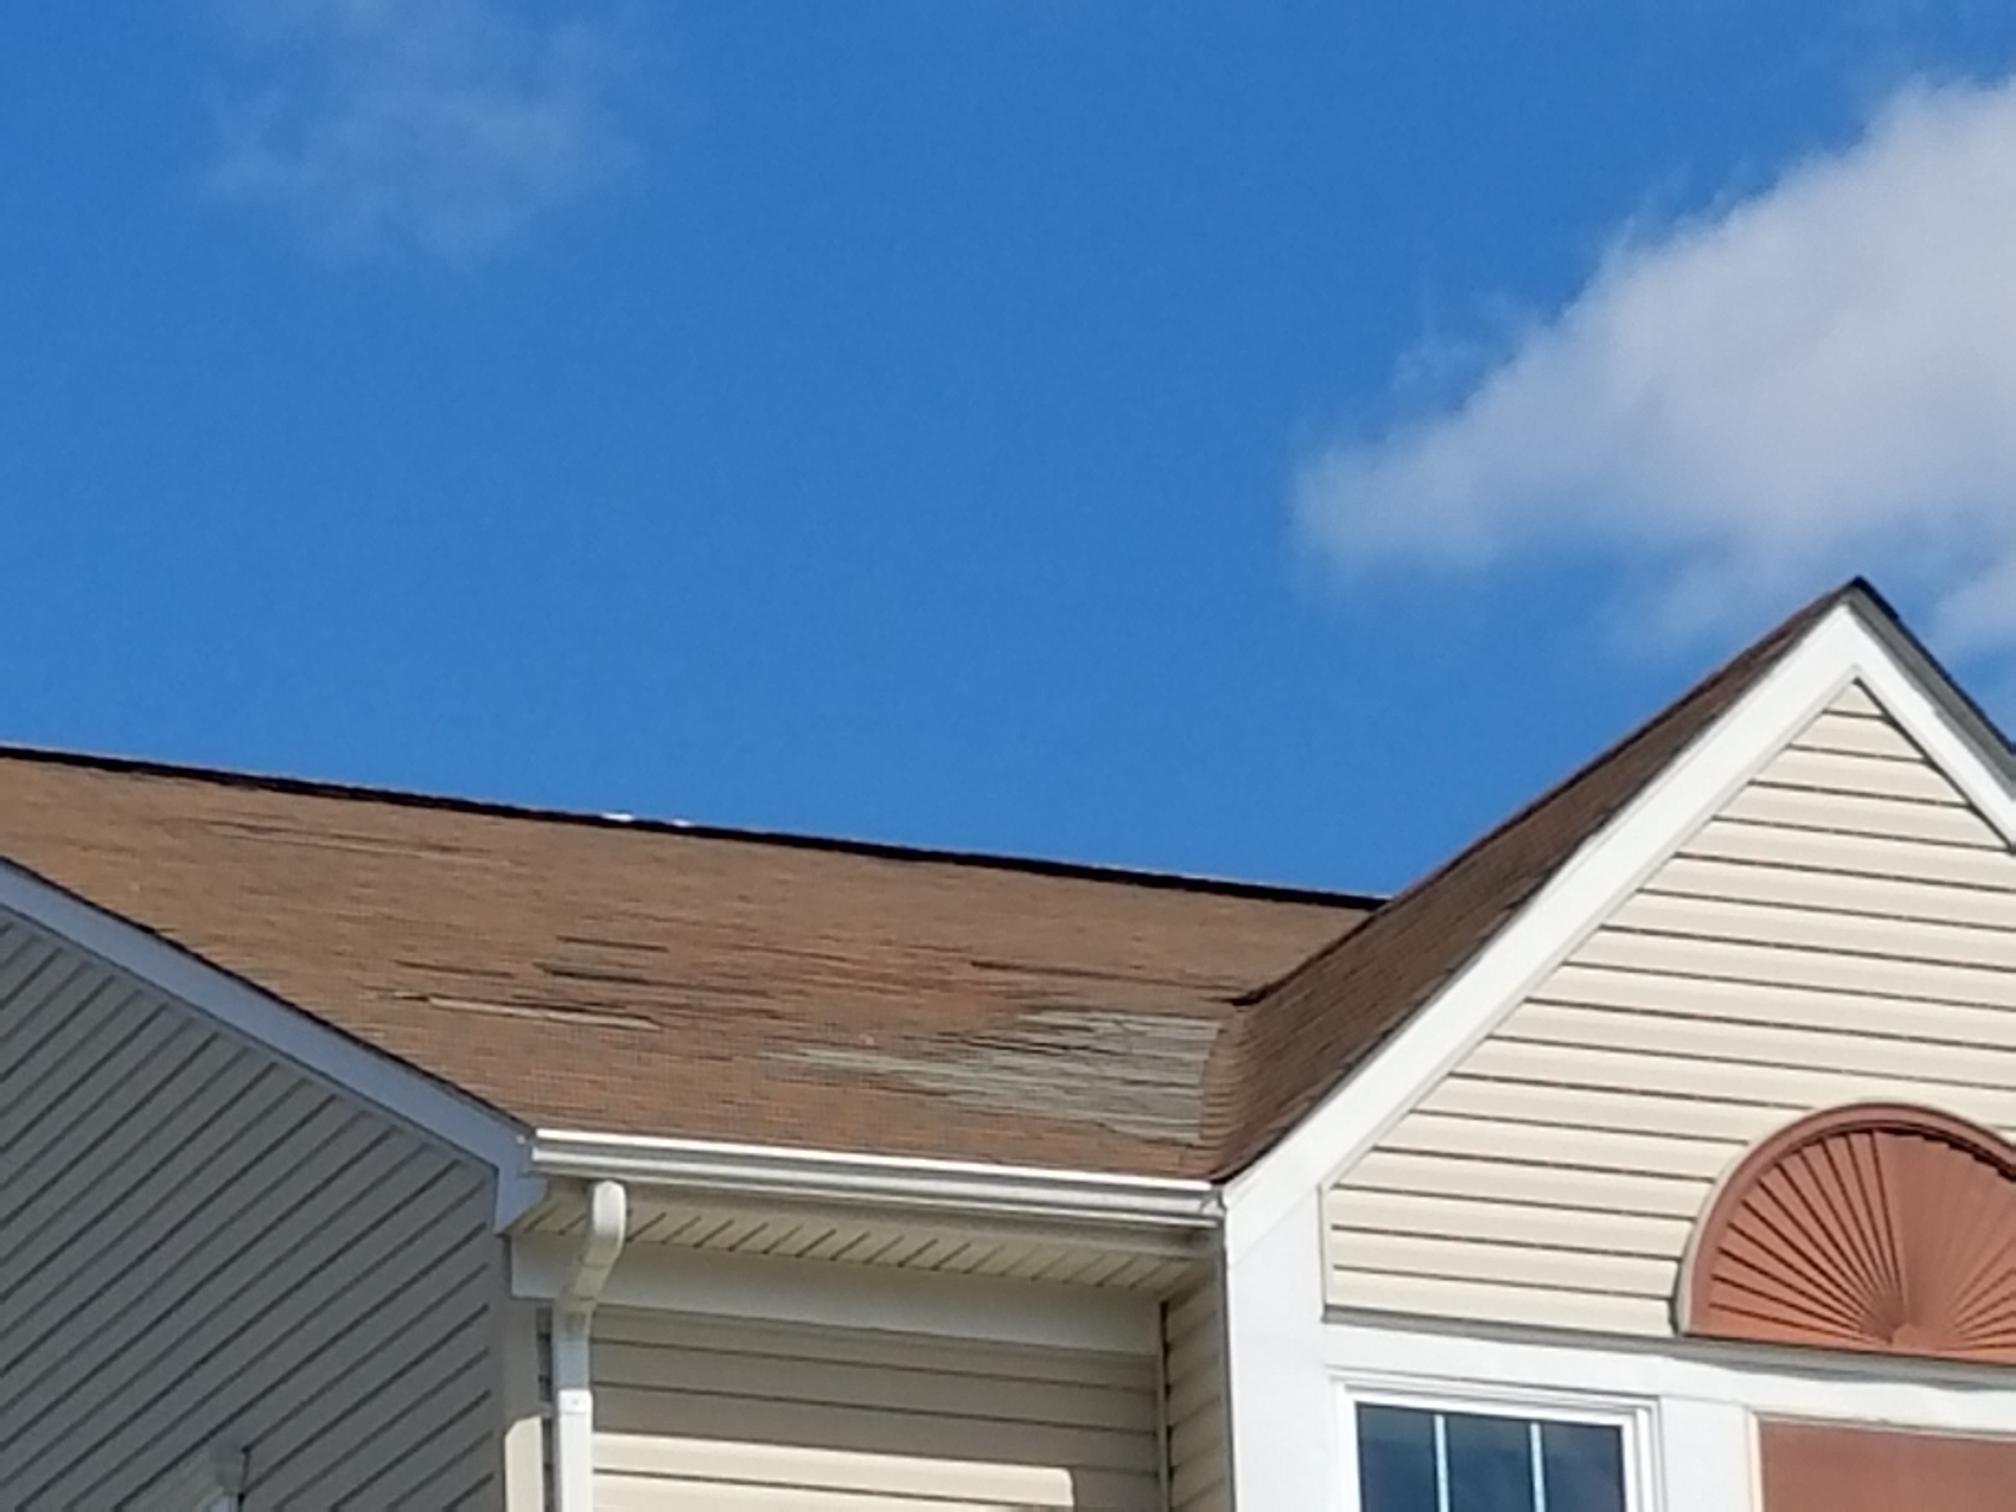 Wind Damaged Roof